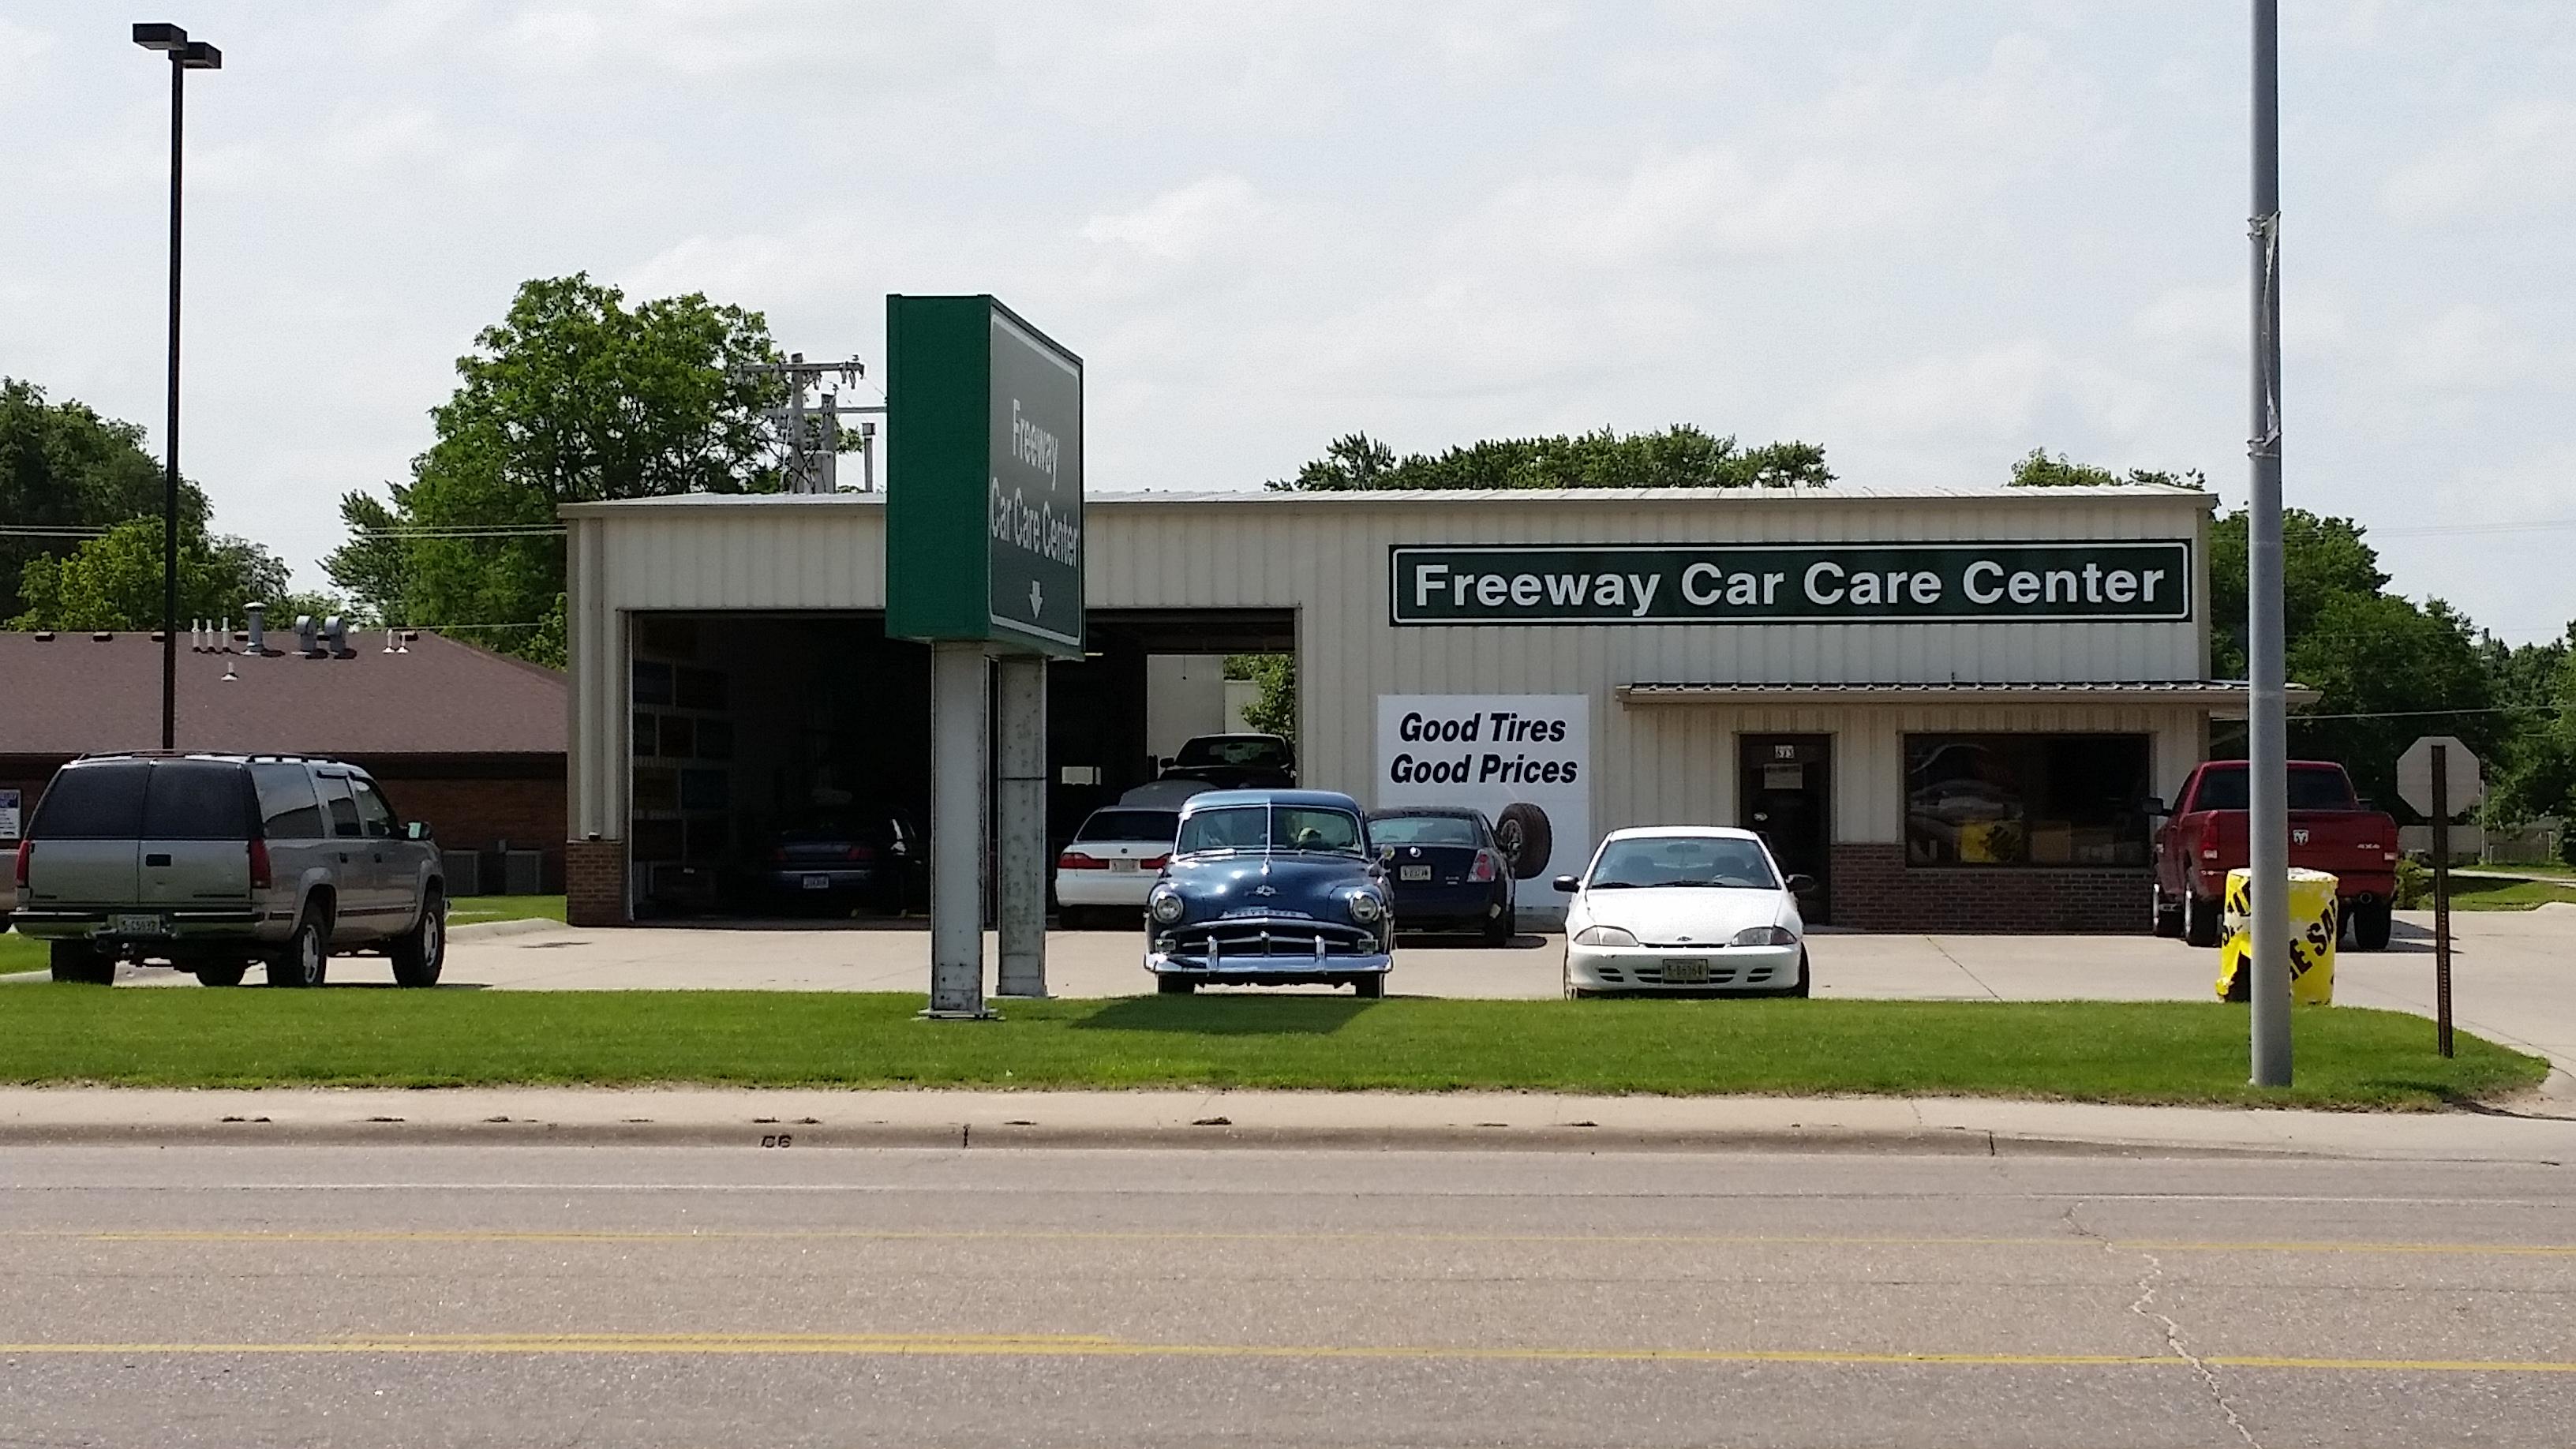 Auto Service Center : Freeway car care center gift certificate